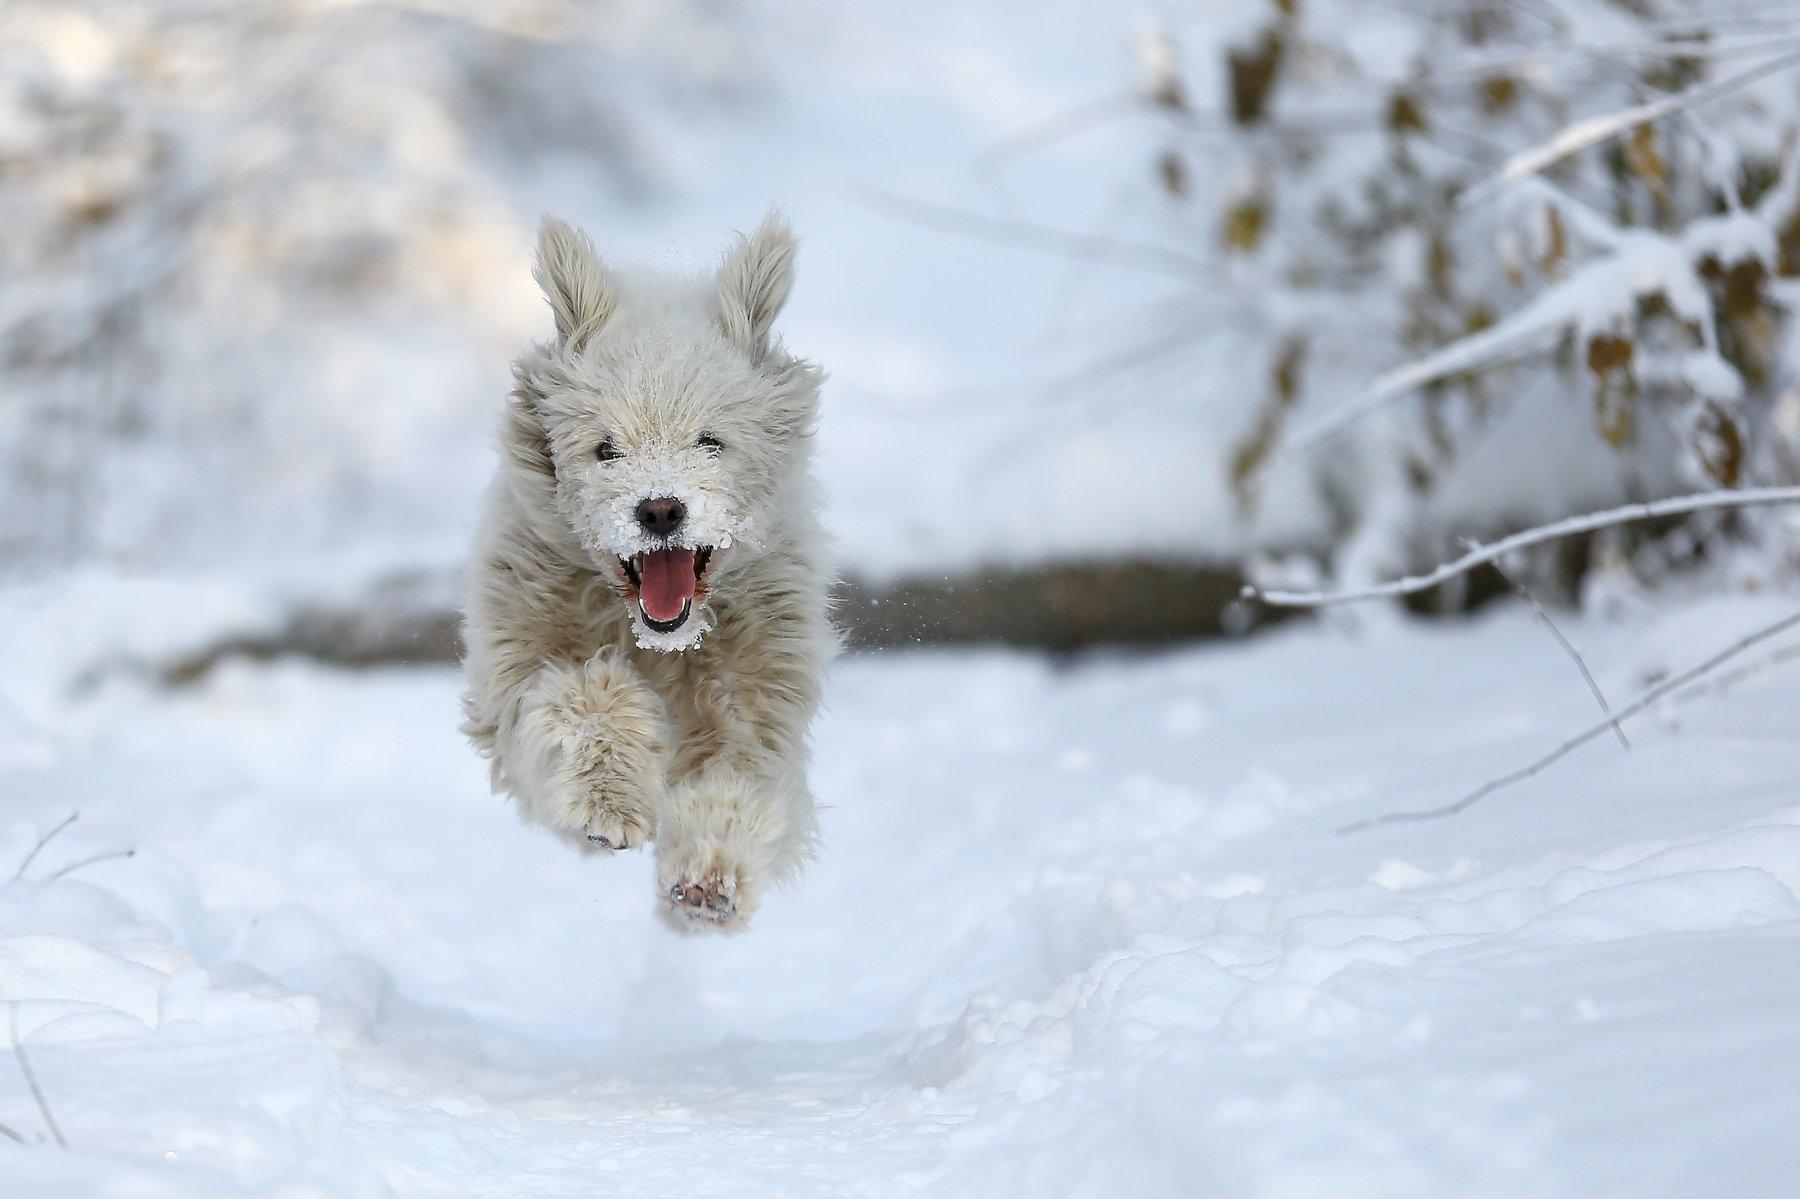 #dog, #nature, #snow, #winter, #зима, #снег, #собака, #эмоции, Константин Слободчук